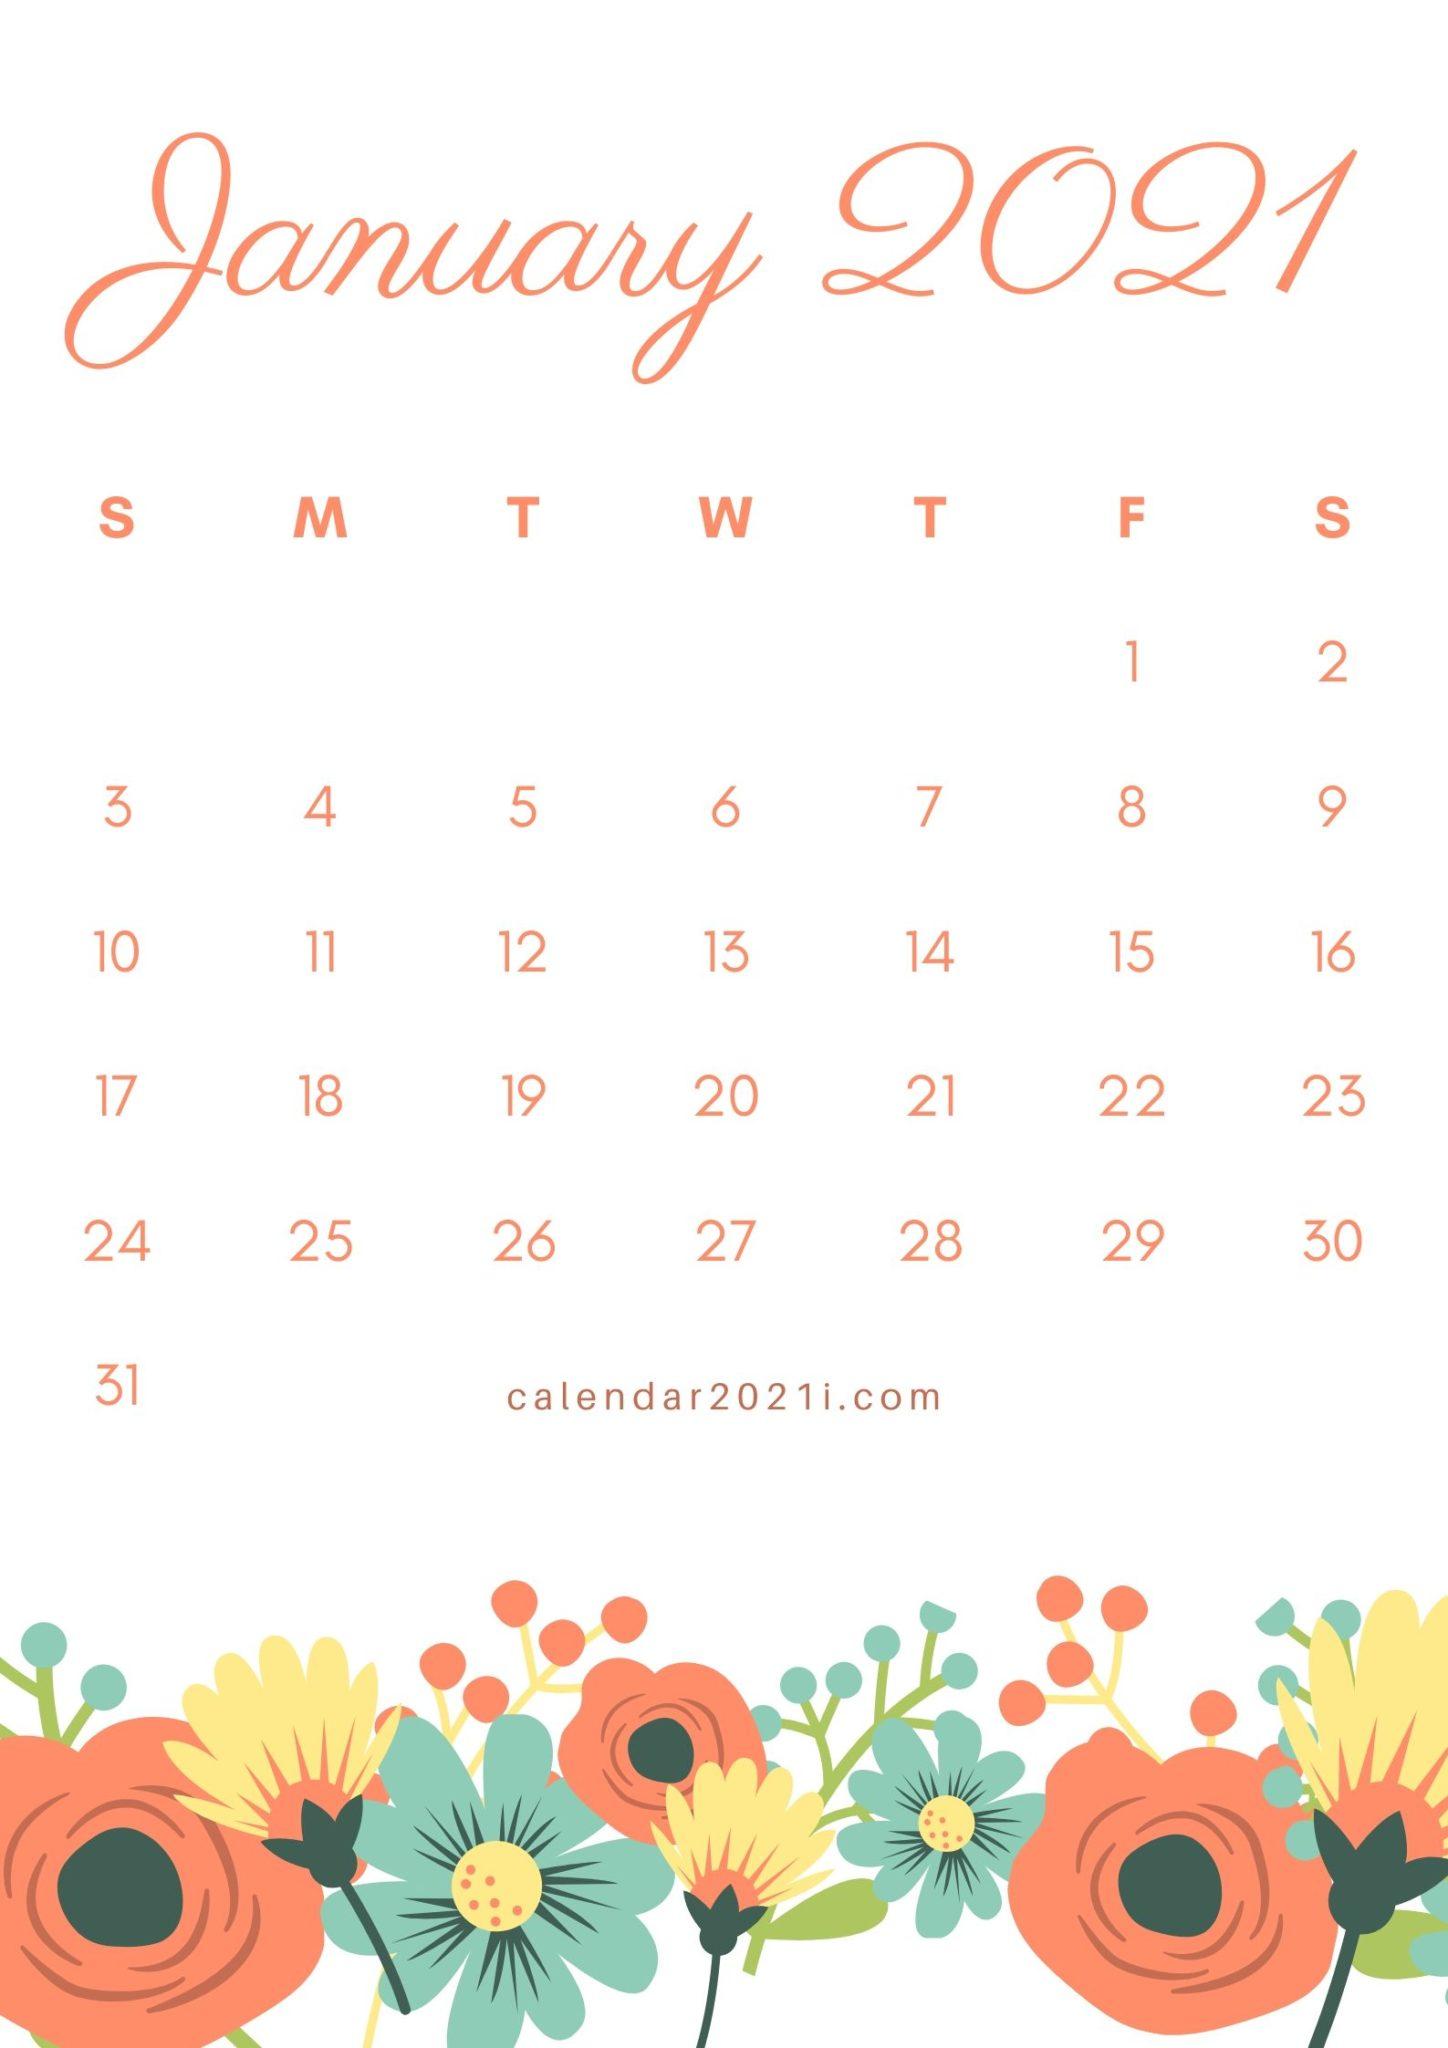 Floral January 2021 Calendar Printable